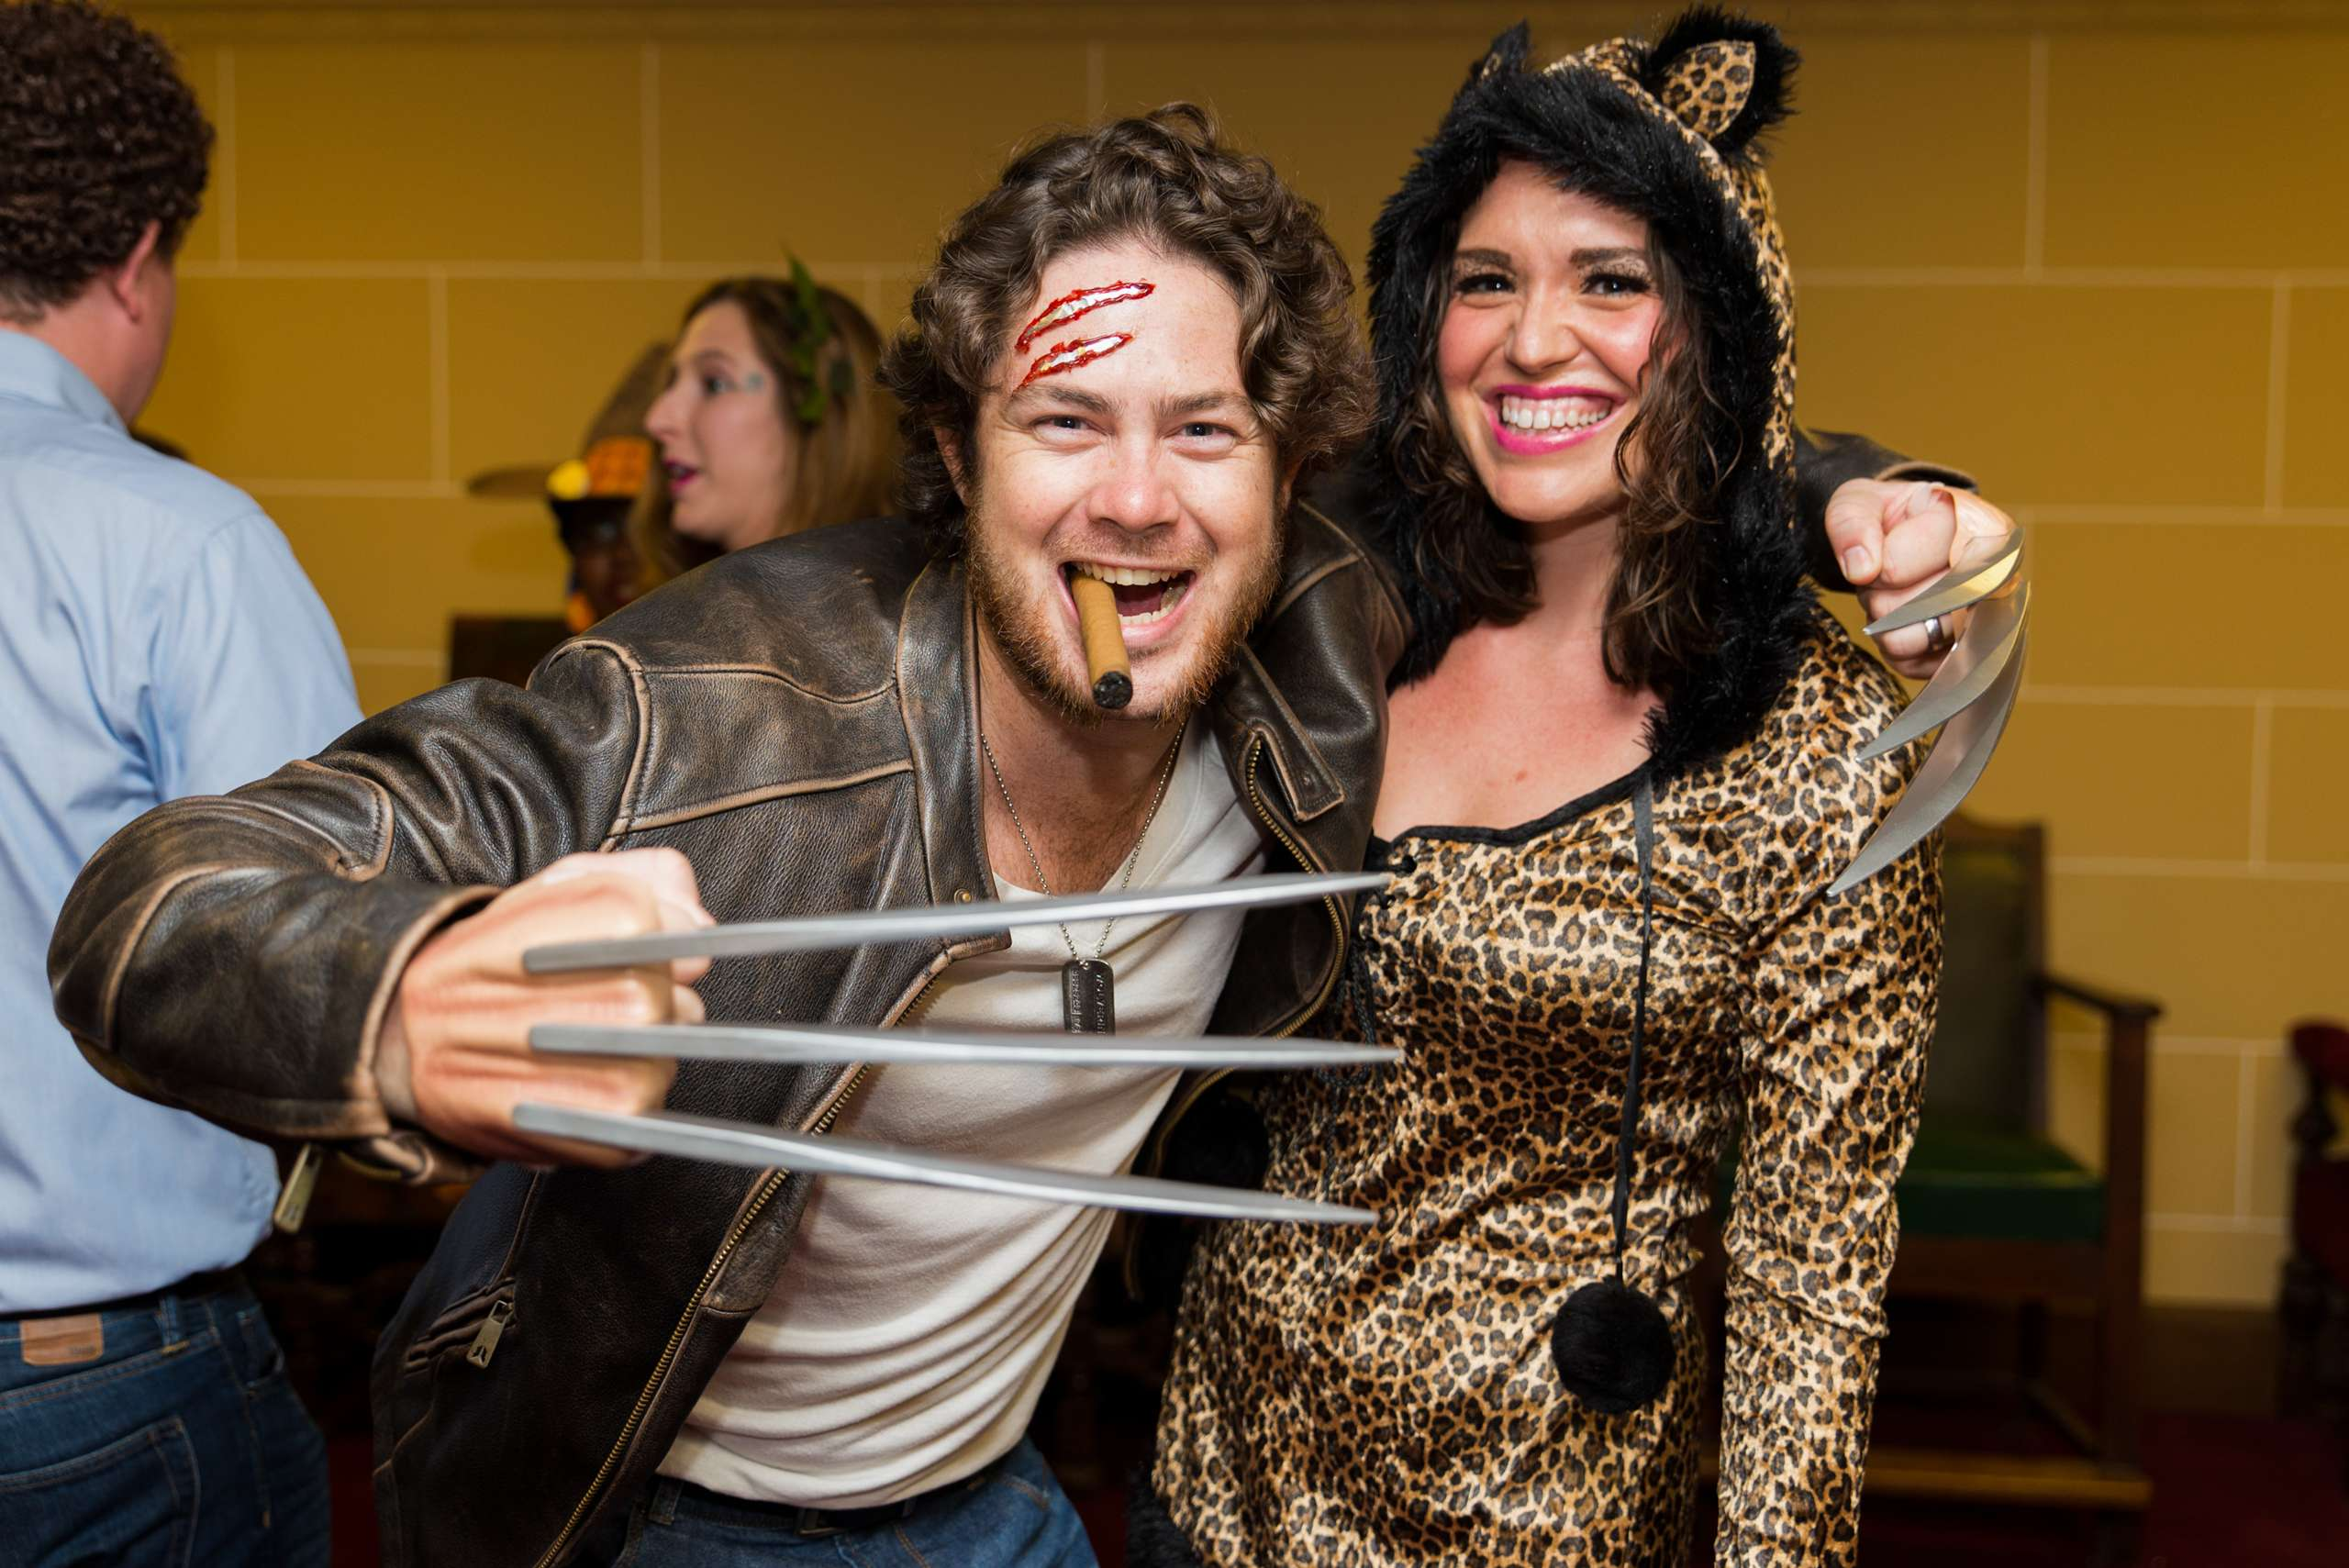 FotosByFlee_ScottishRite_Halloween_2015-2092.jpg